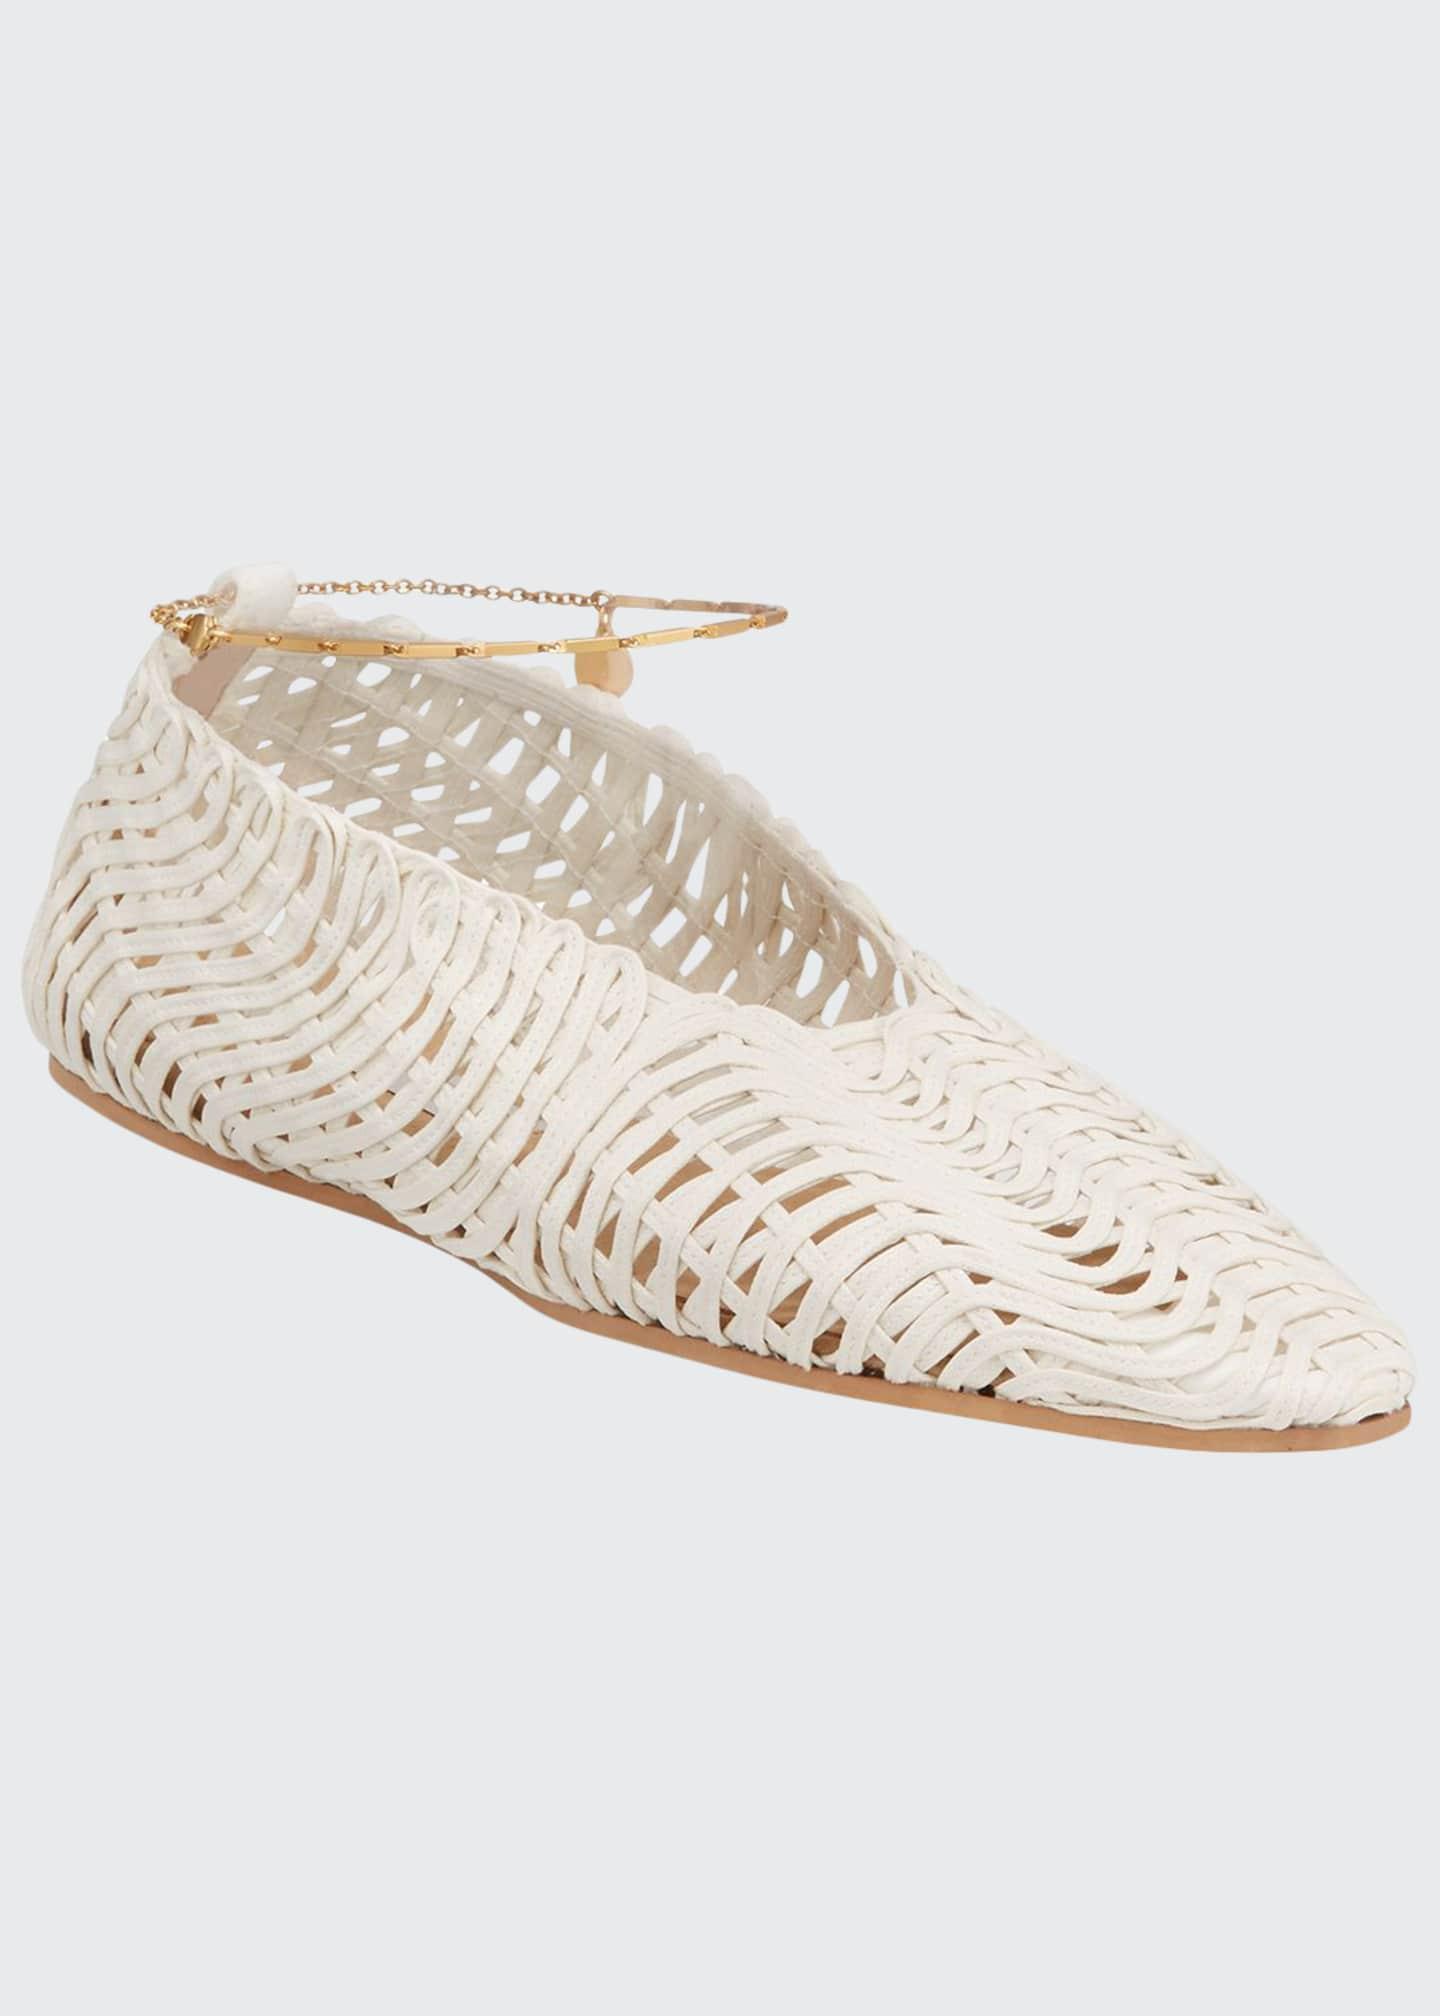 Stella McCartney Crochet Ankle-Chain Flats